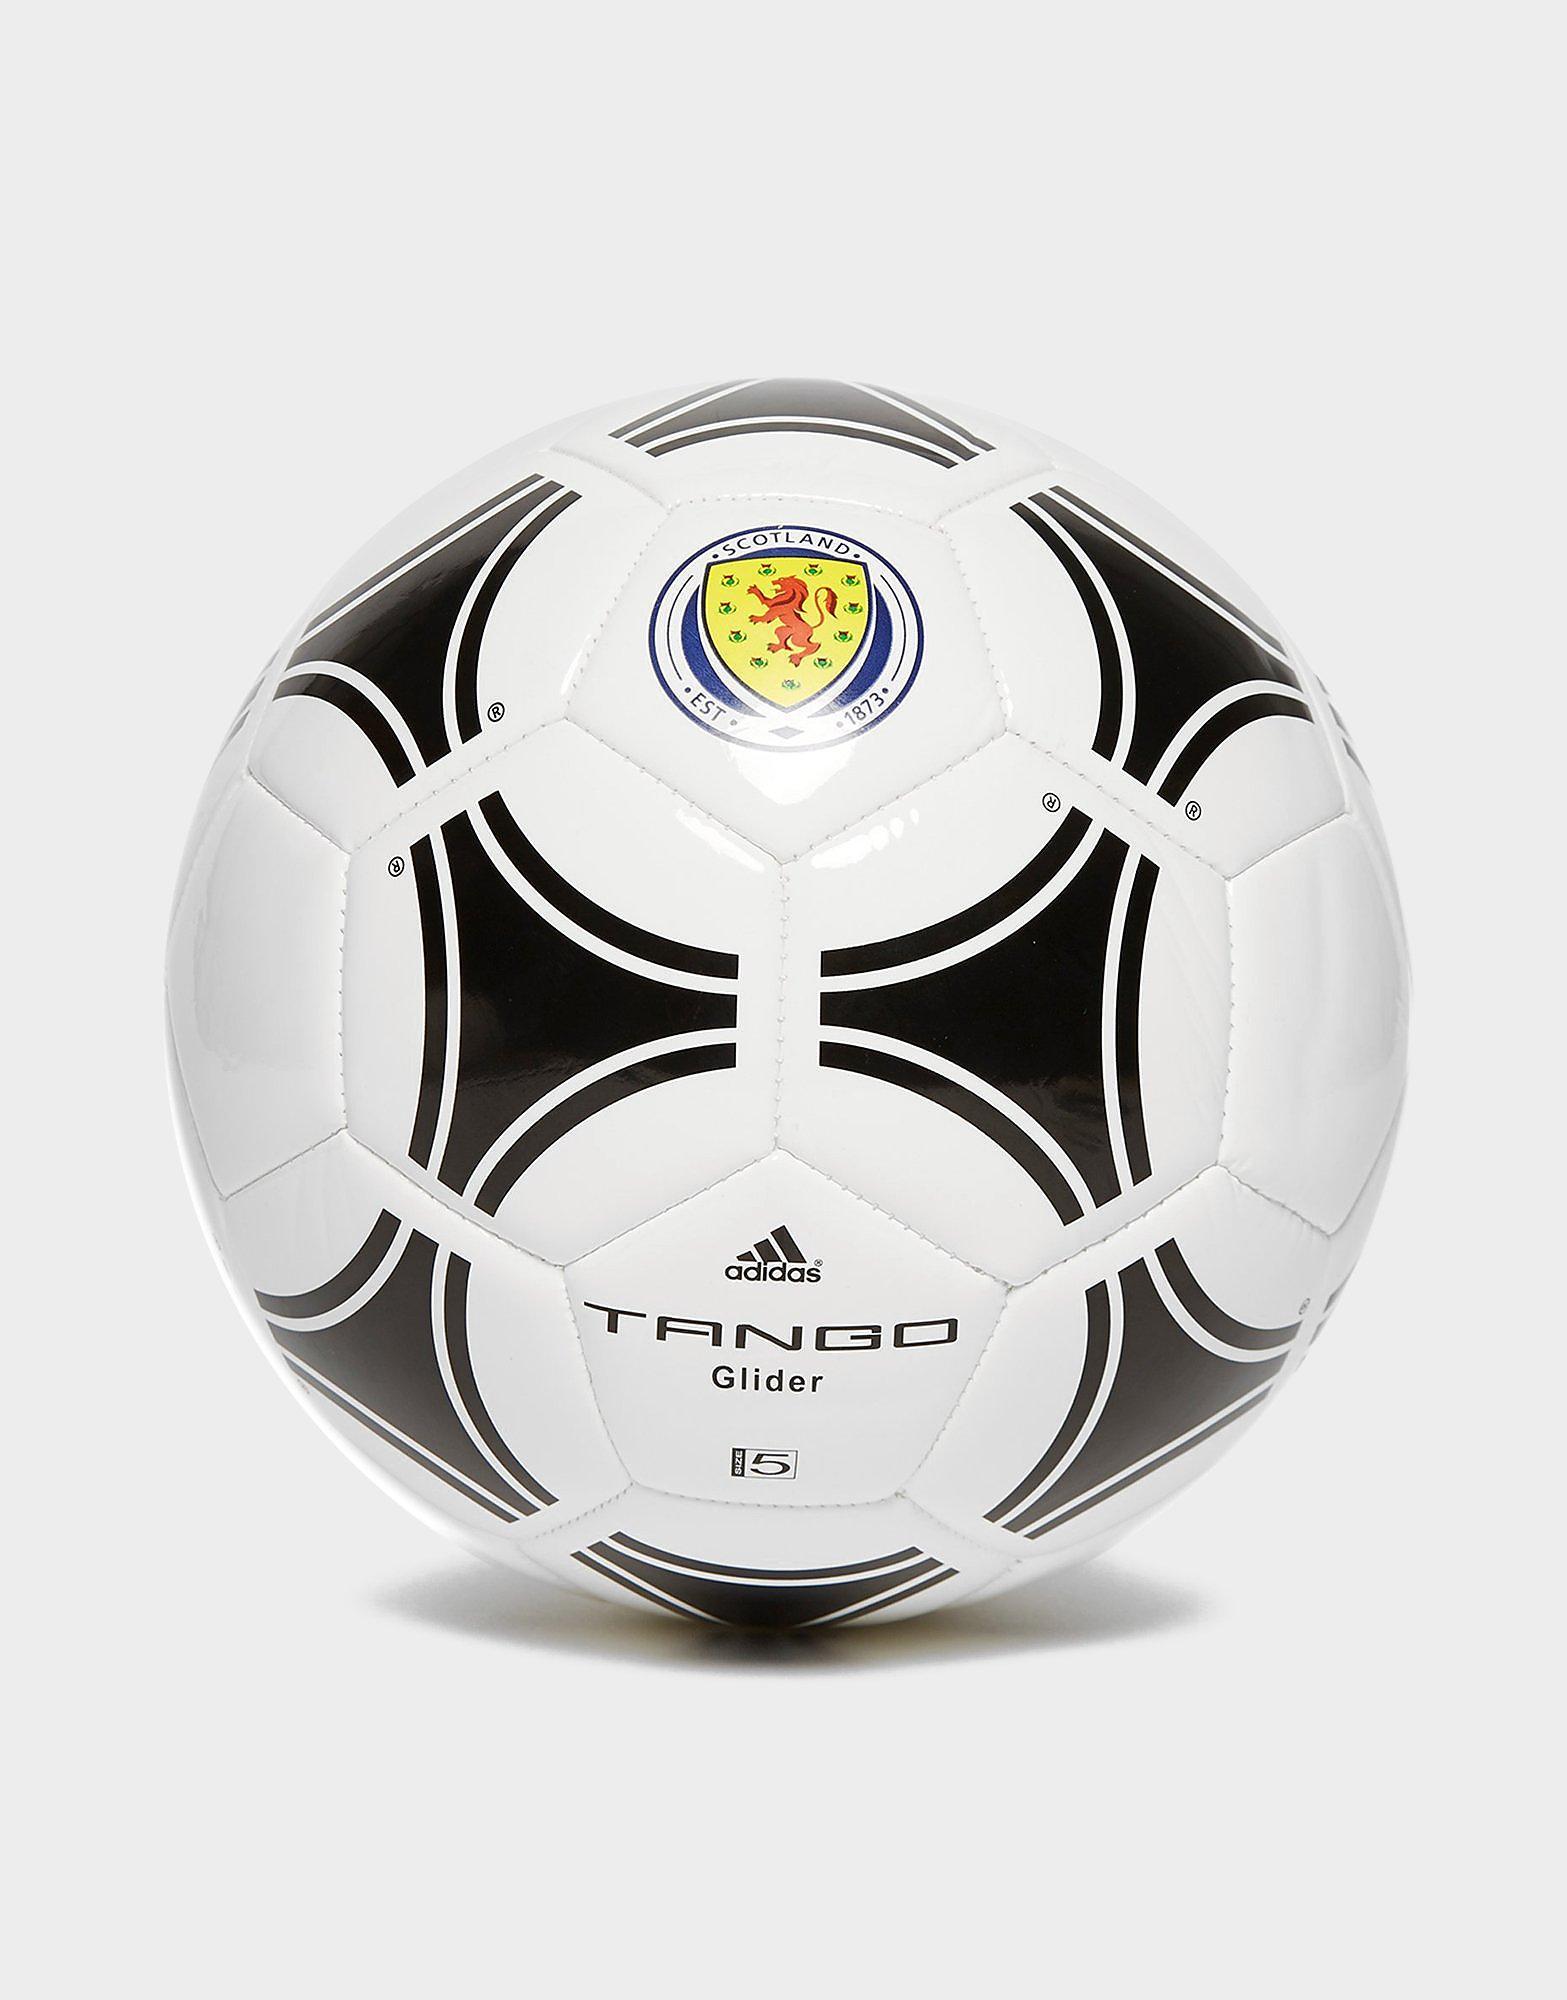 adidas Schotland FA Tango Glider voetbal